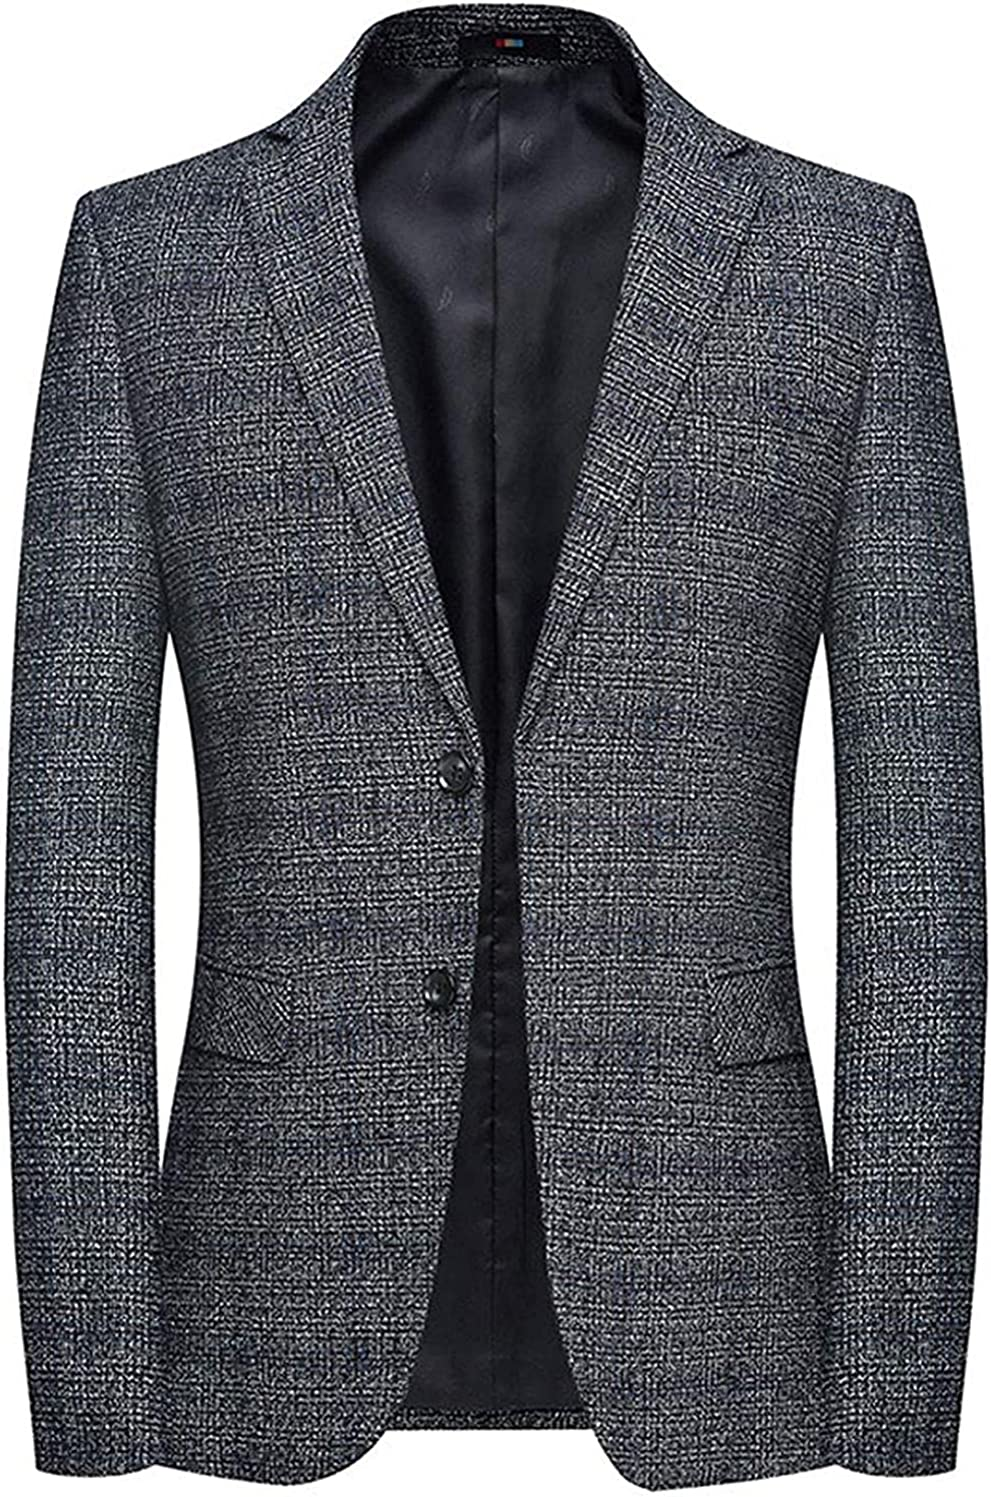 Men's Casual Slim Fit 2 Button Tweed Plaid Blazer Jacket Sport Coat